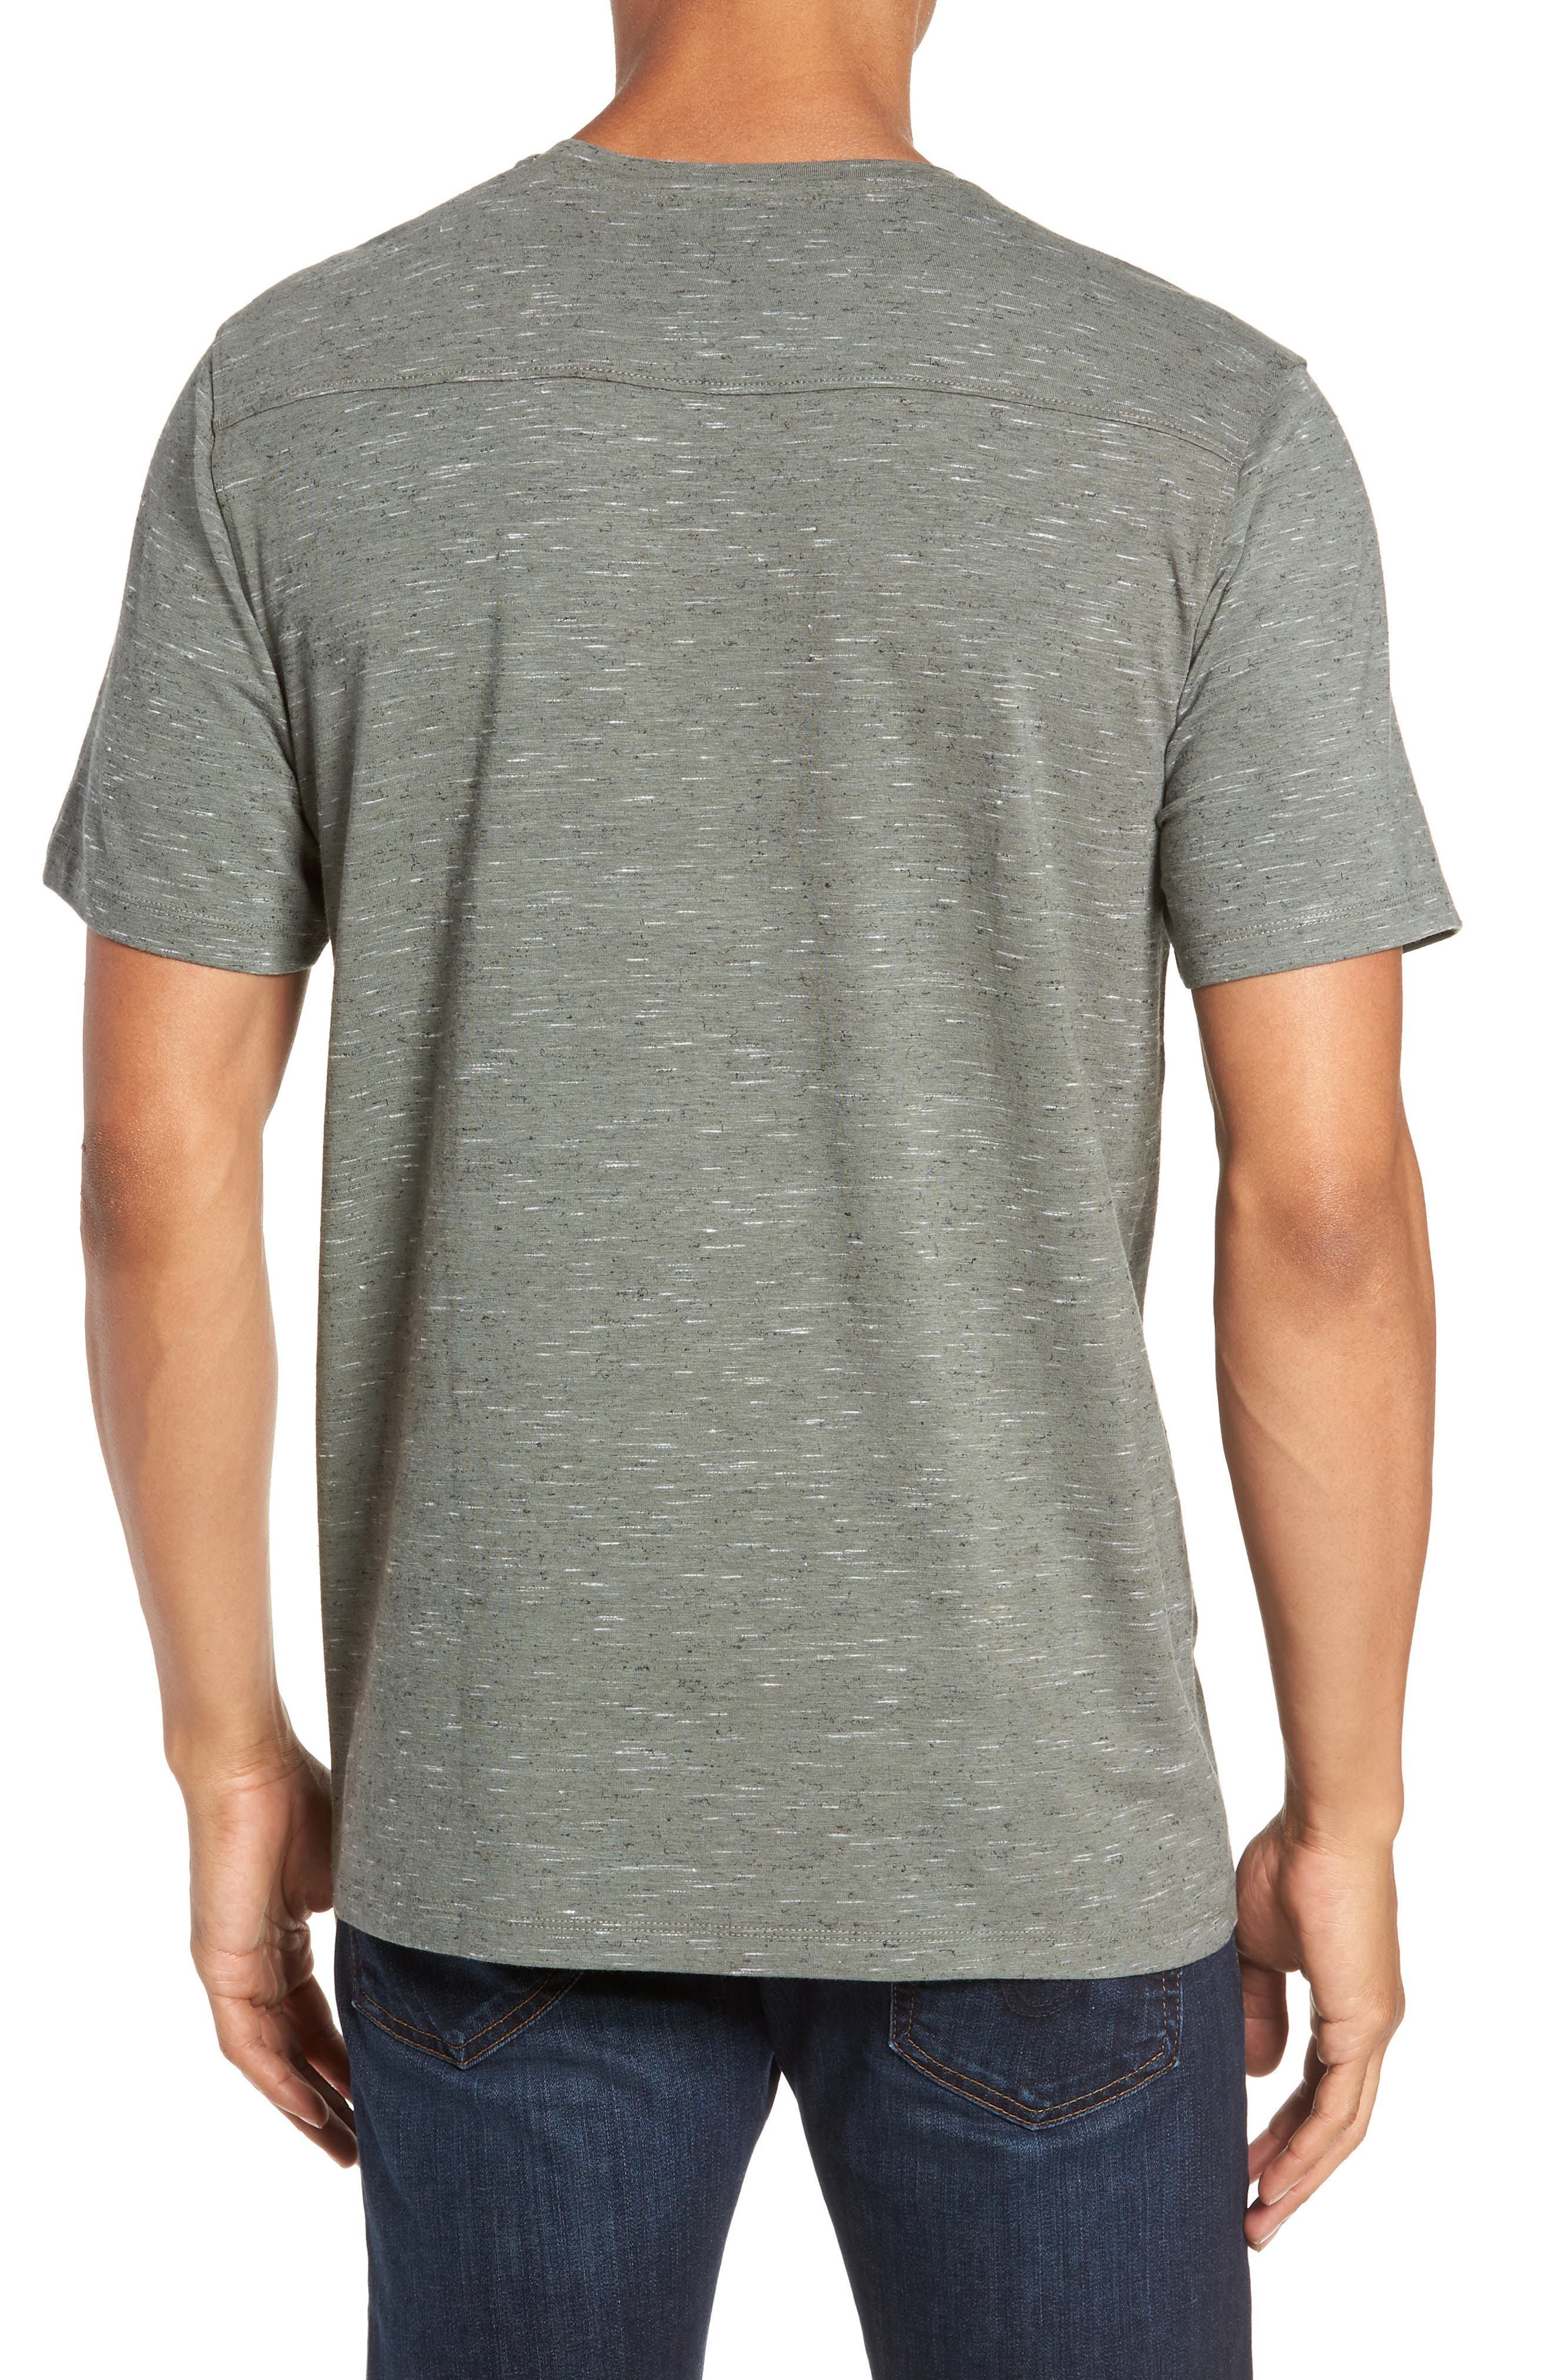 Neppy Crewneck T-Shirt,                             Alternate thumbnail 2, color,                             GREY LUNAR NEP